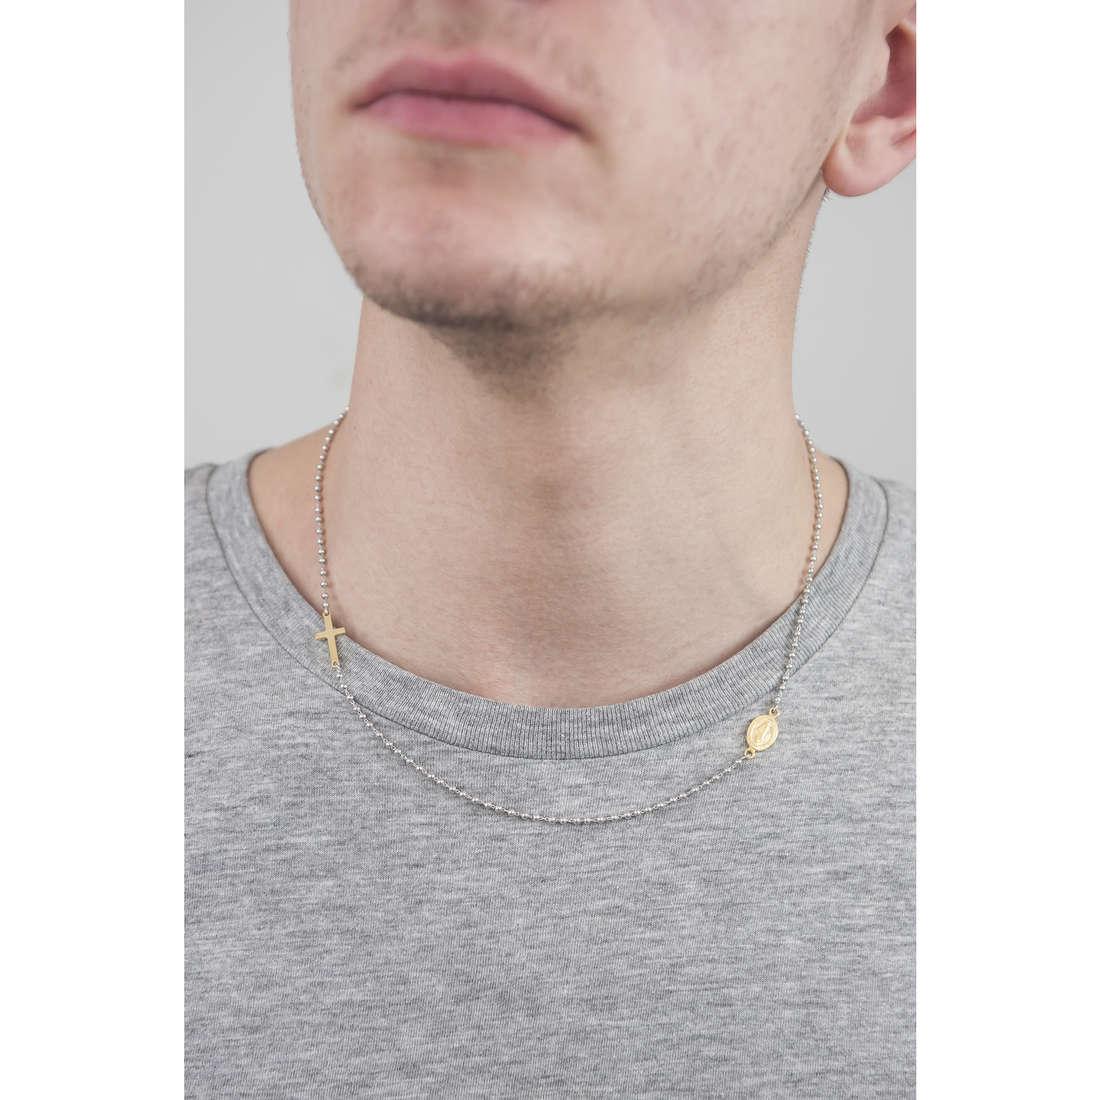 Cesare Paciotti necklaces man JPCL1239B indosso